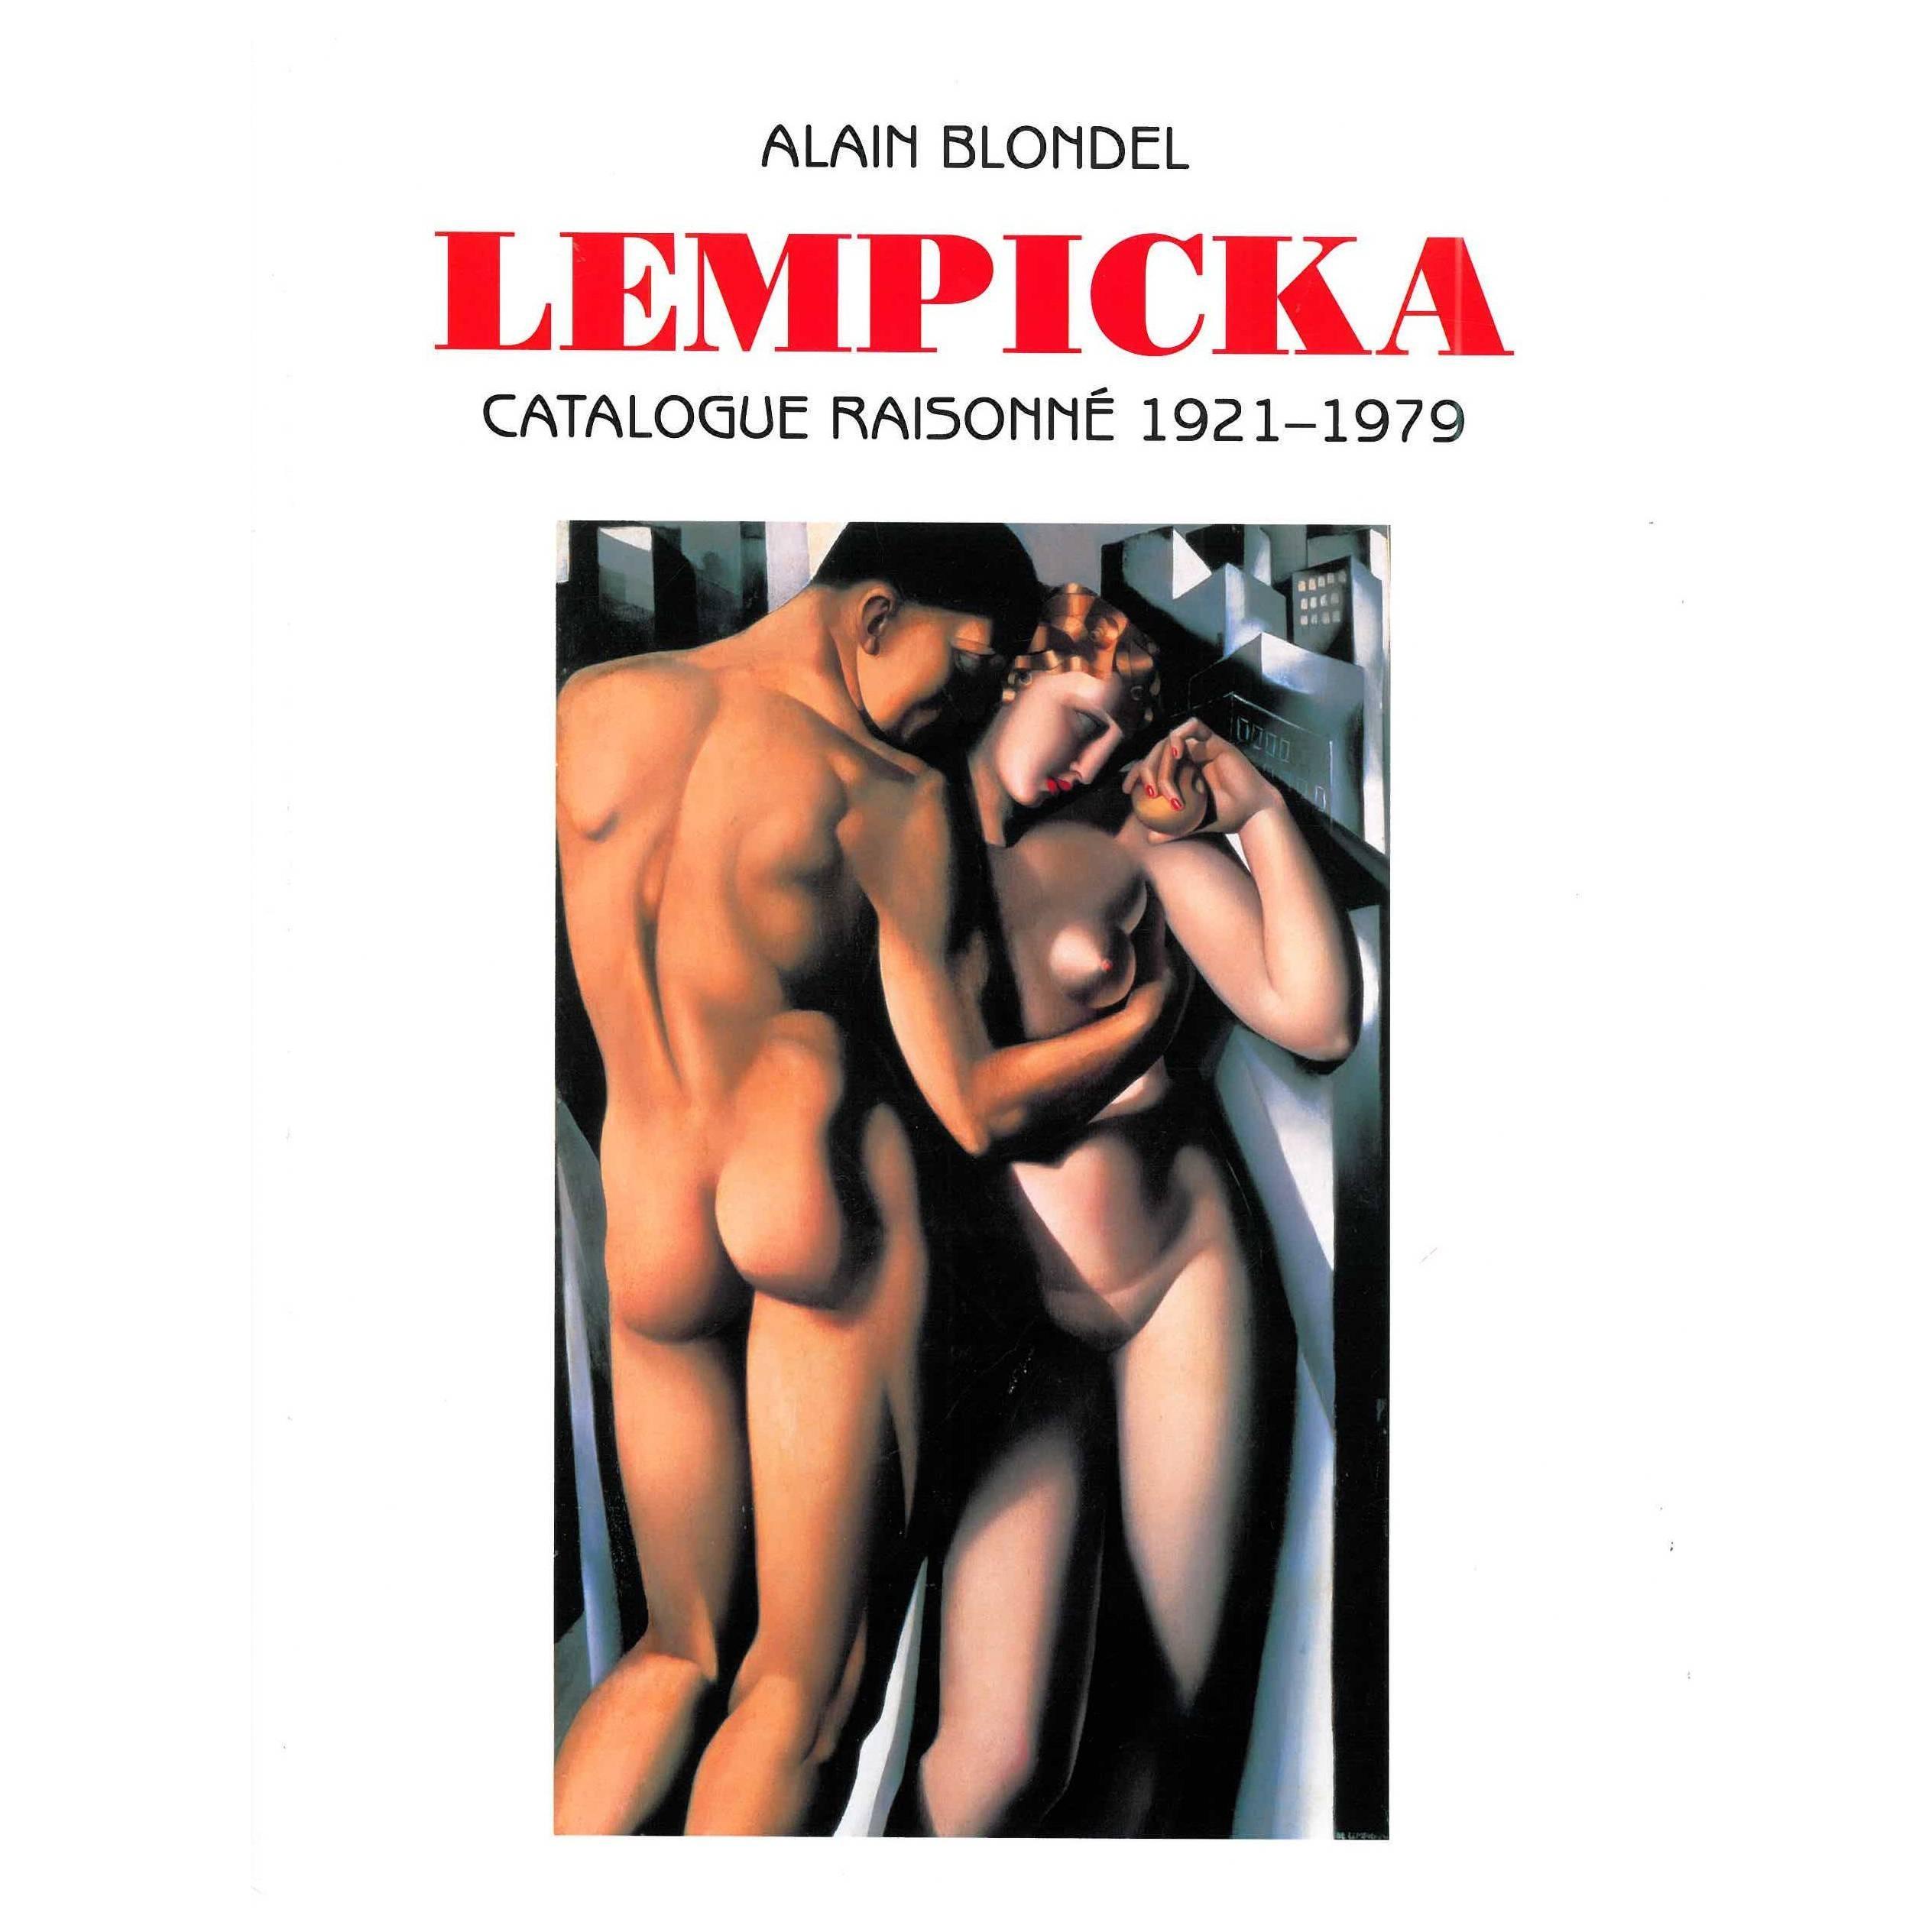 """Lempicka"" Catalogue Raisonne 1921-1979, Book"